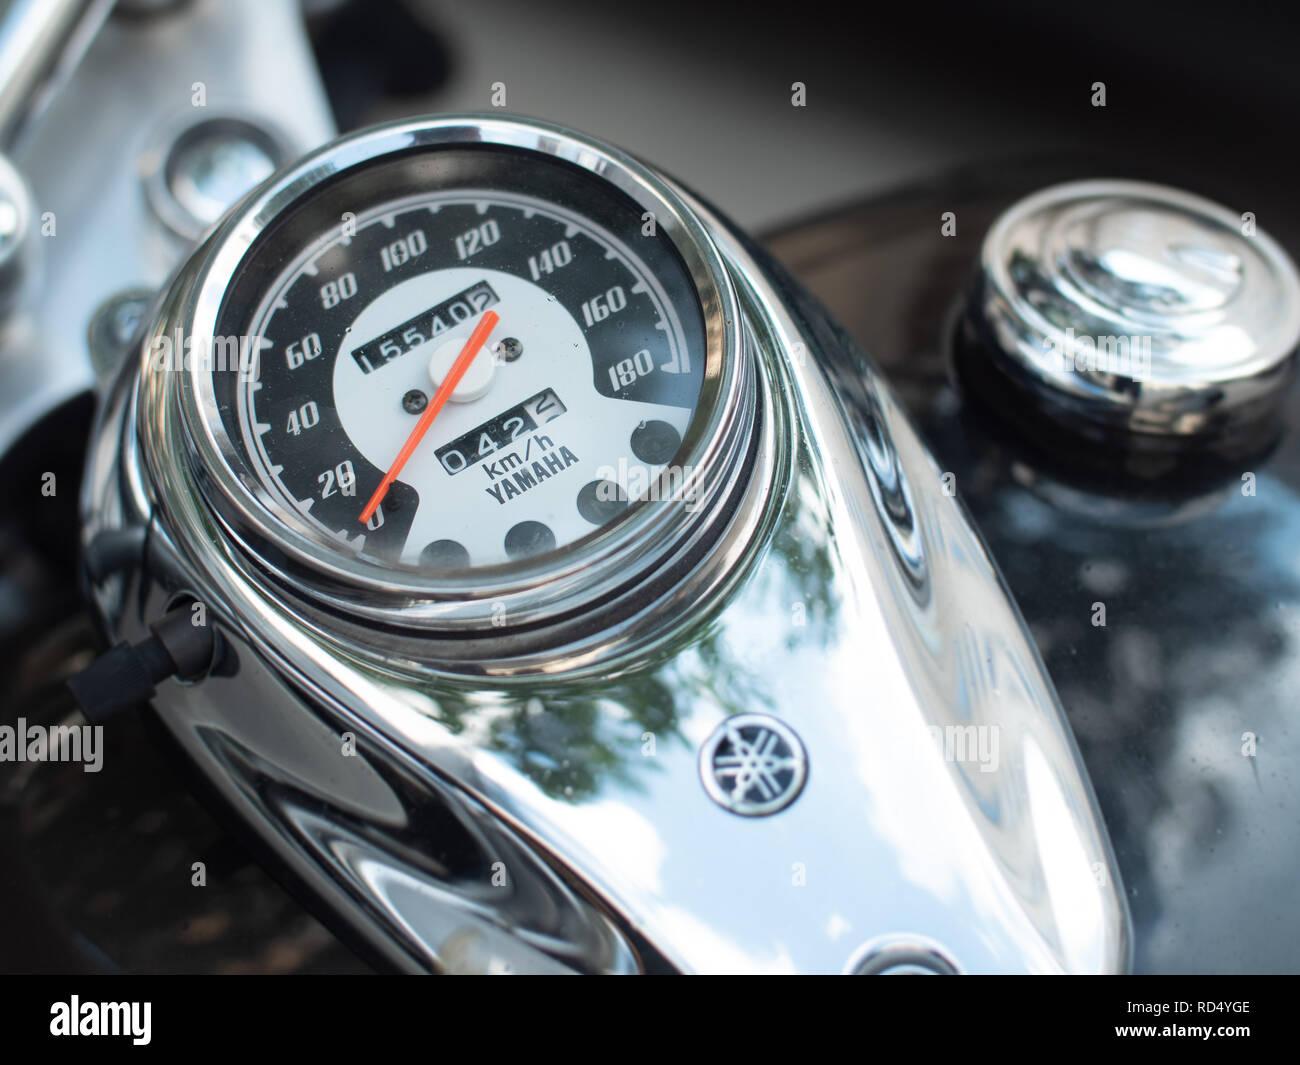 Yamaha Motorcycle Stock Photos & Yamaha Motorcycle Stock